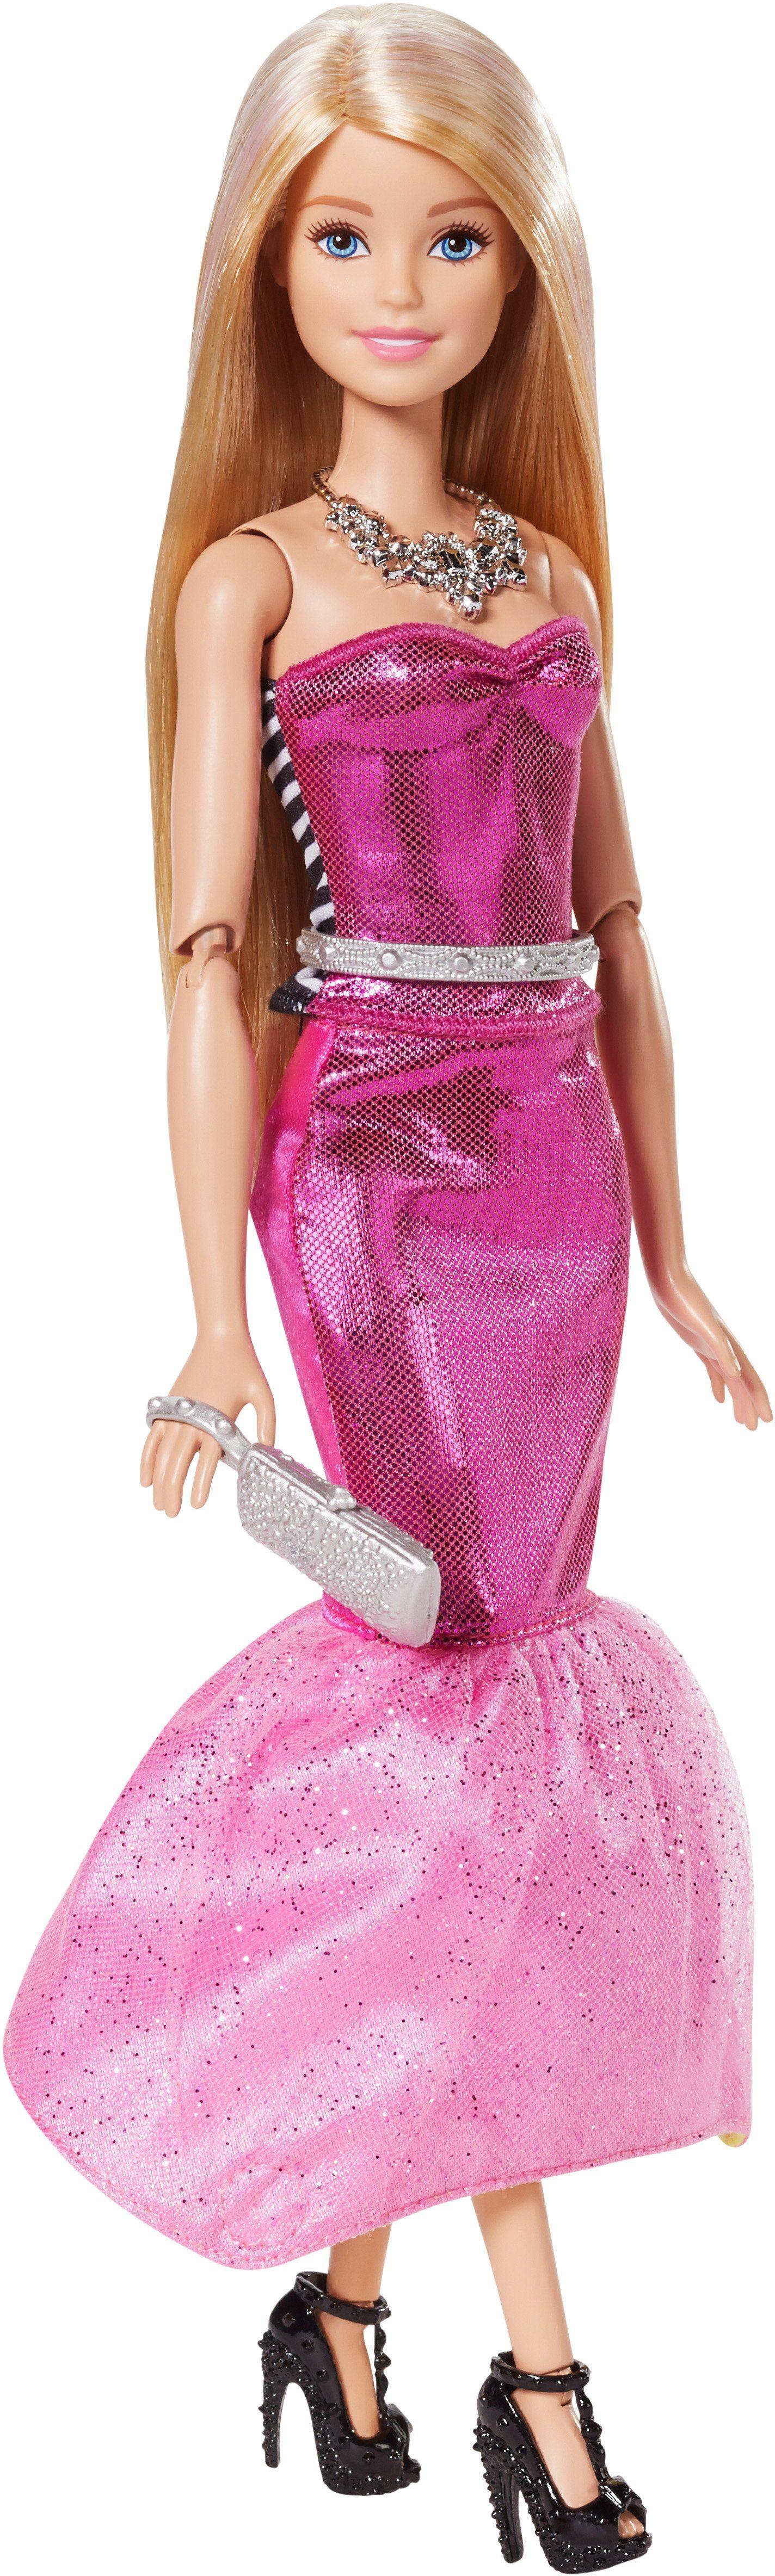 Mattel Puppe mit 2 Outfits, »Barbie Modetransformation«